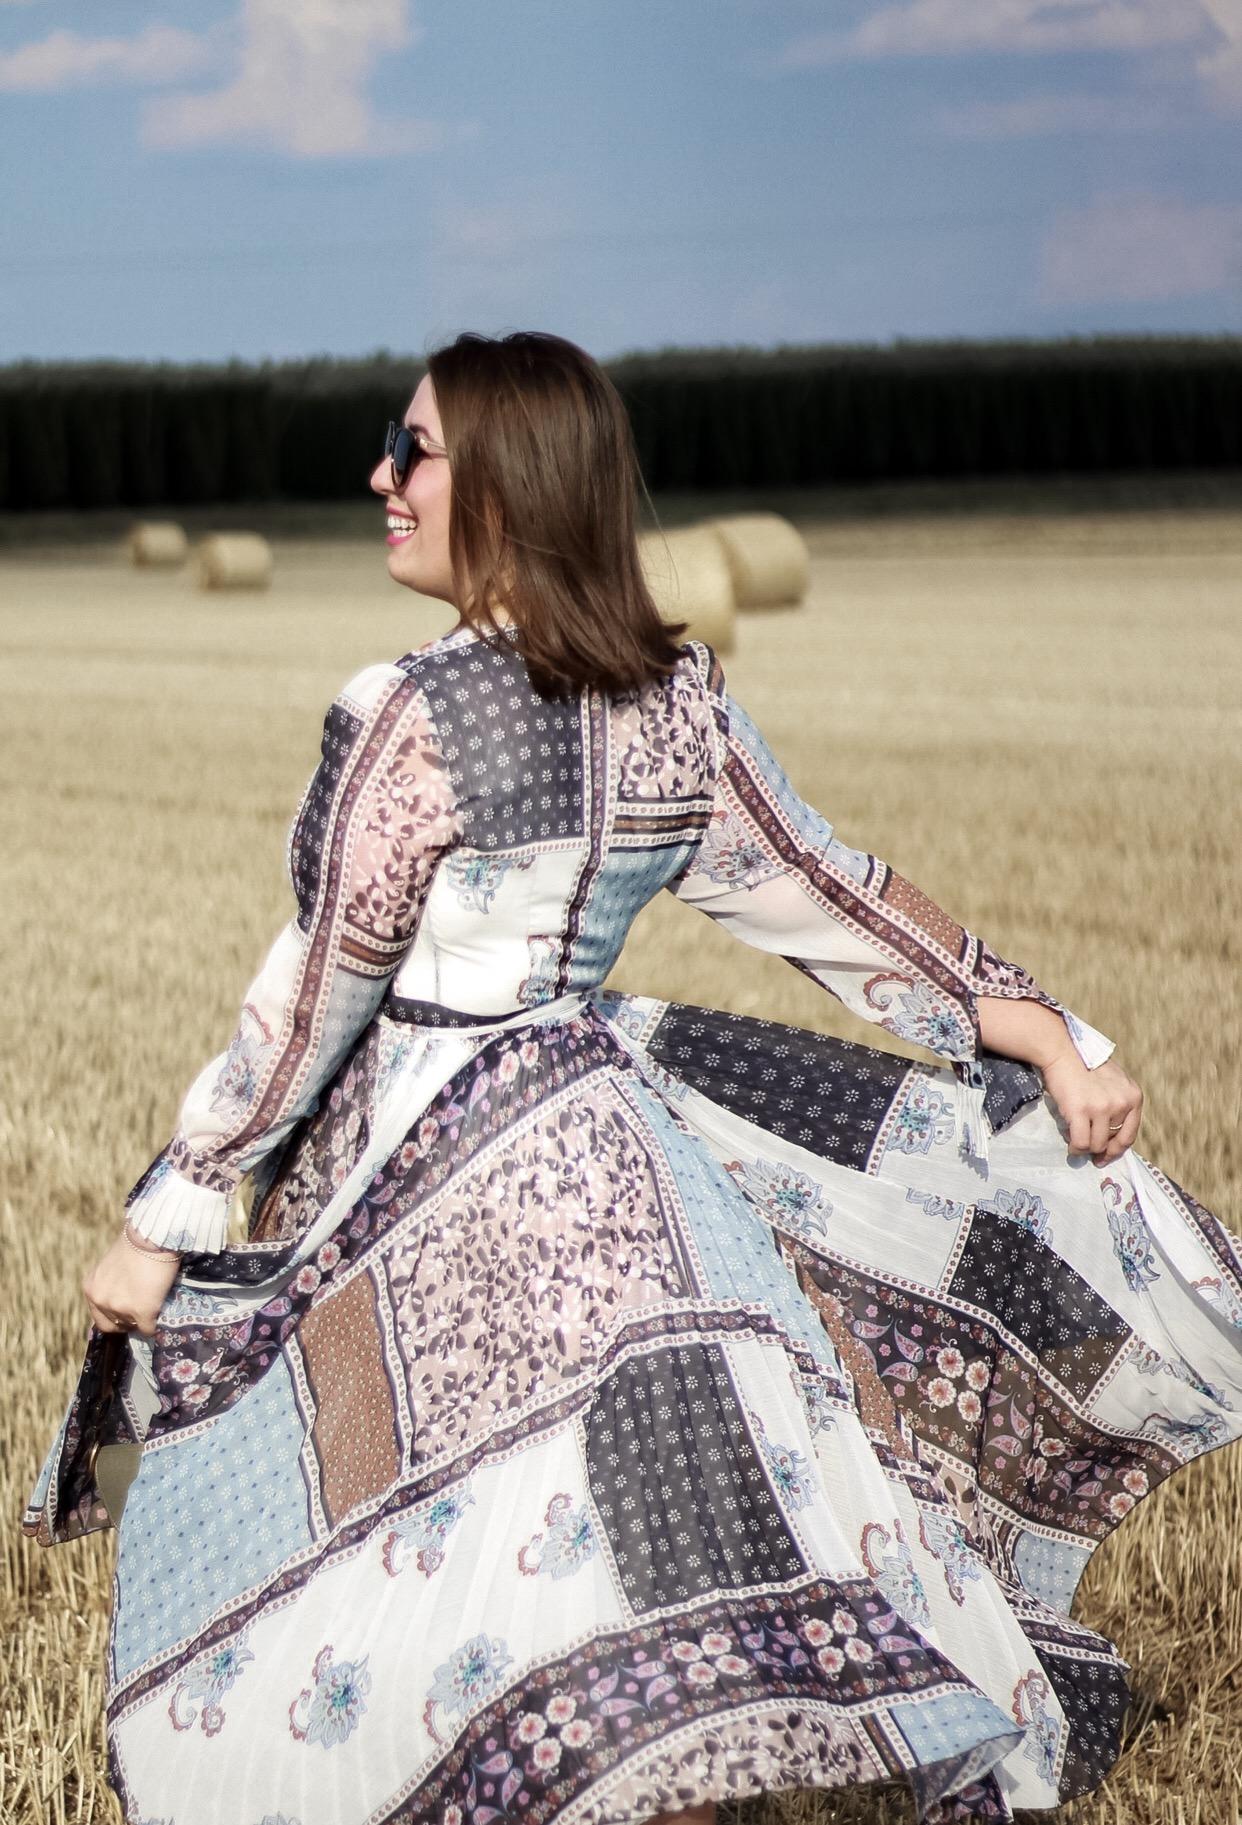 Boho-Vibes-Hippie-Kleid-Miss-Suzie-Loves-Susanne-Heidebach-Feminines-Patchwork-Kleid-H&M-Wickelkleid-Fotoshooting-Weizenfeld